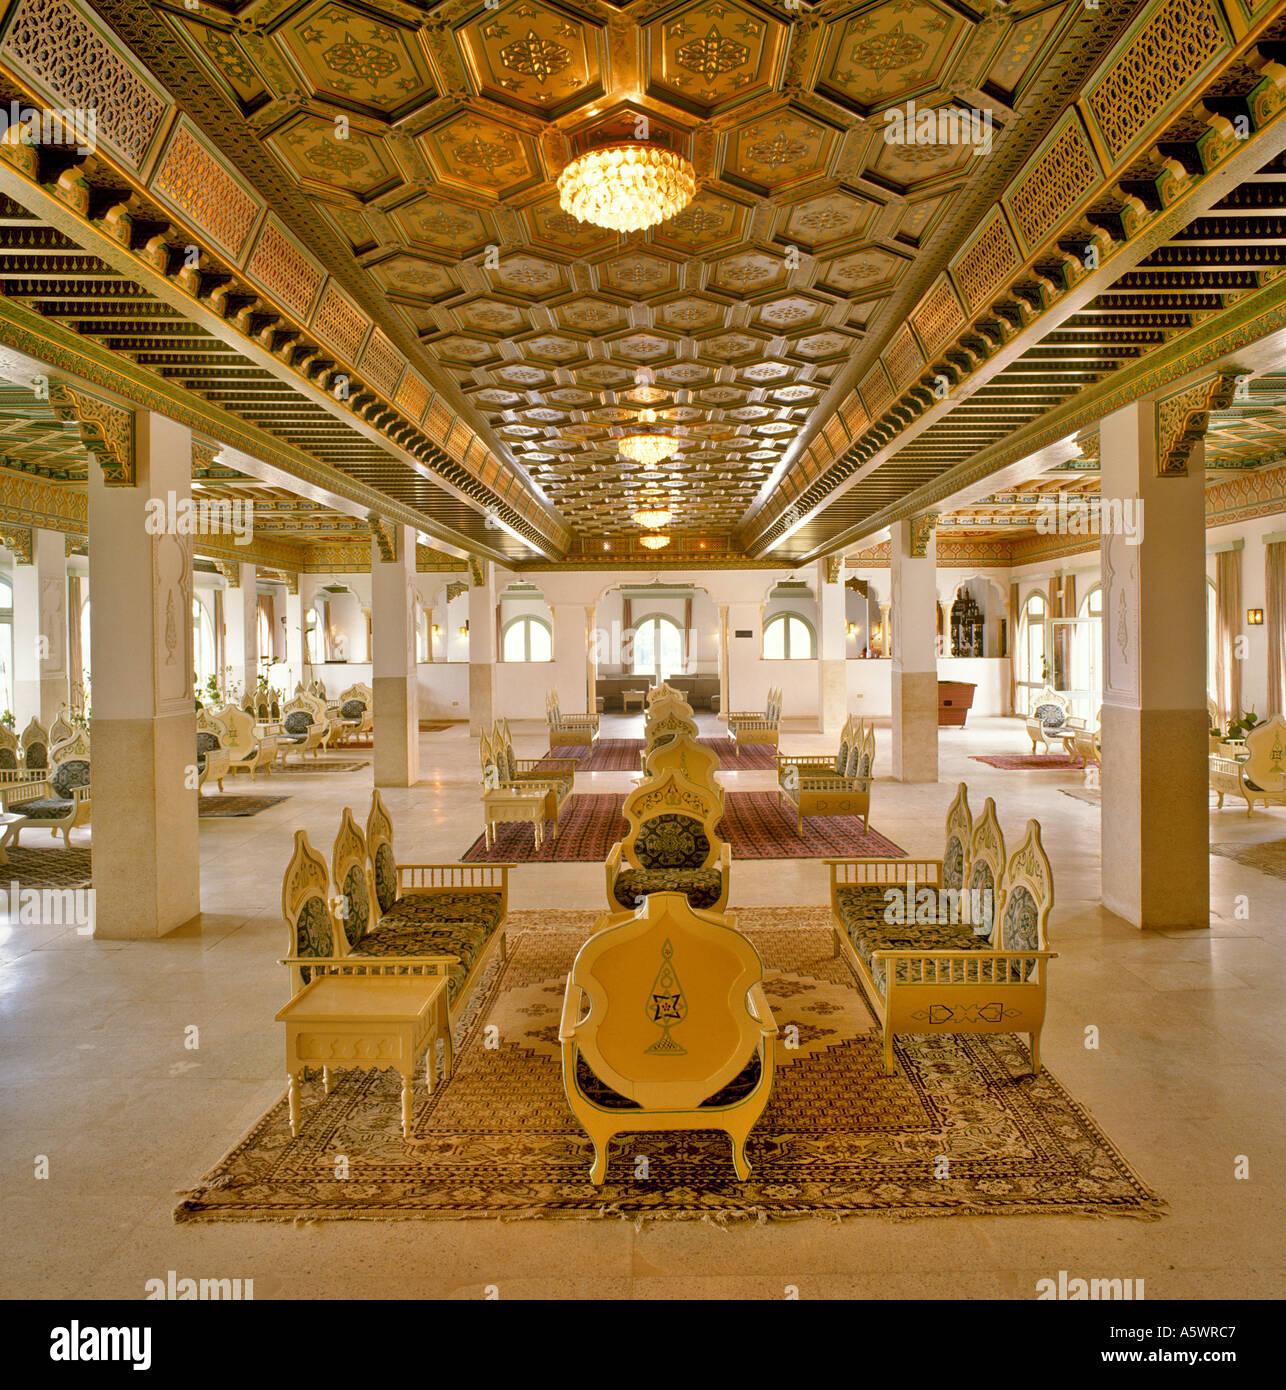 traditional hotel interior hammamet tunisia north africa - Traditional Hotel Interior